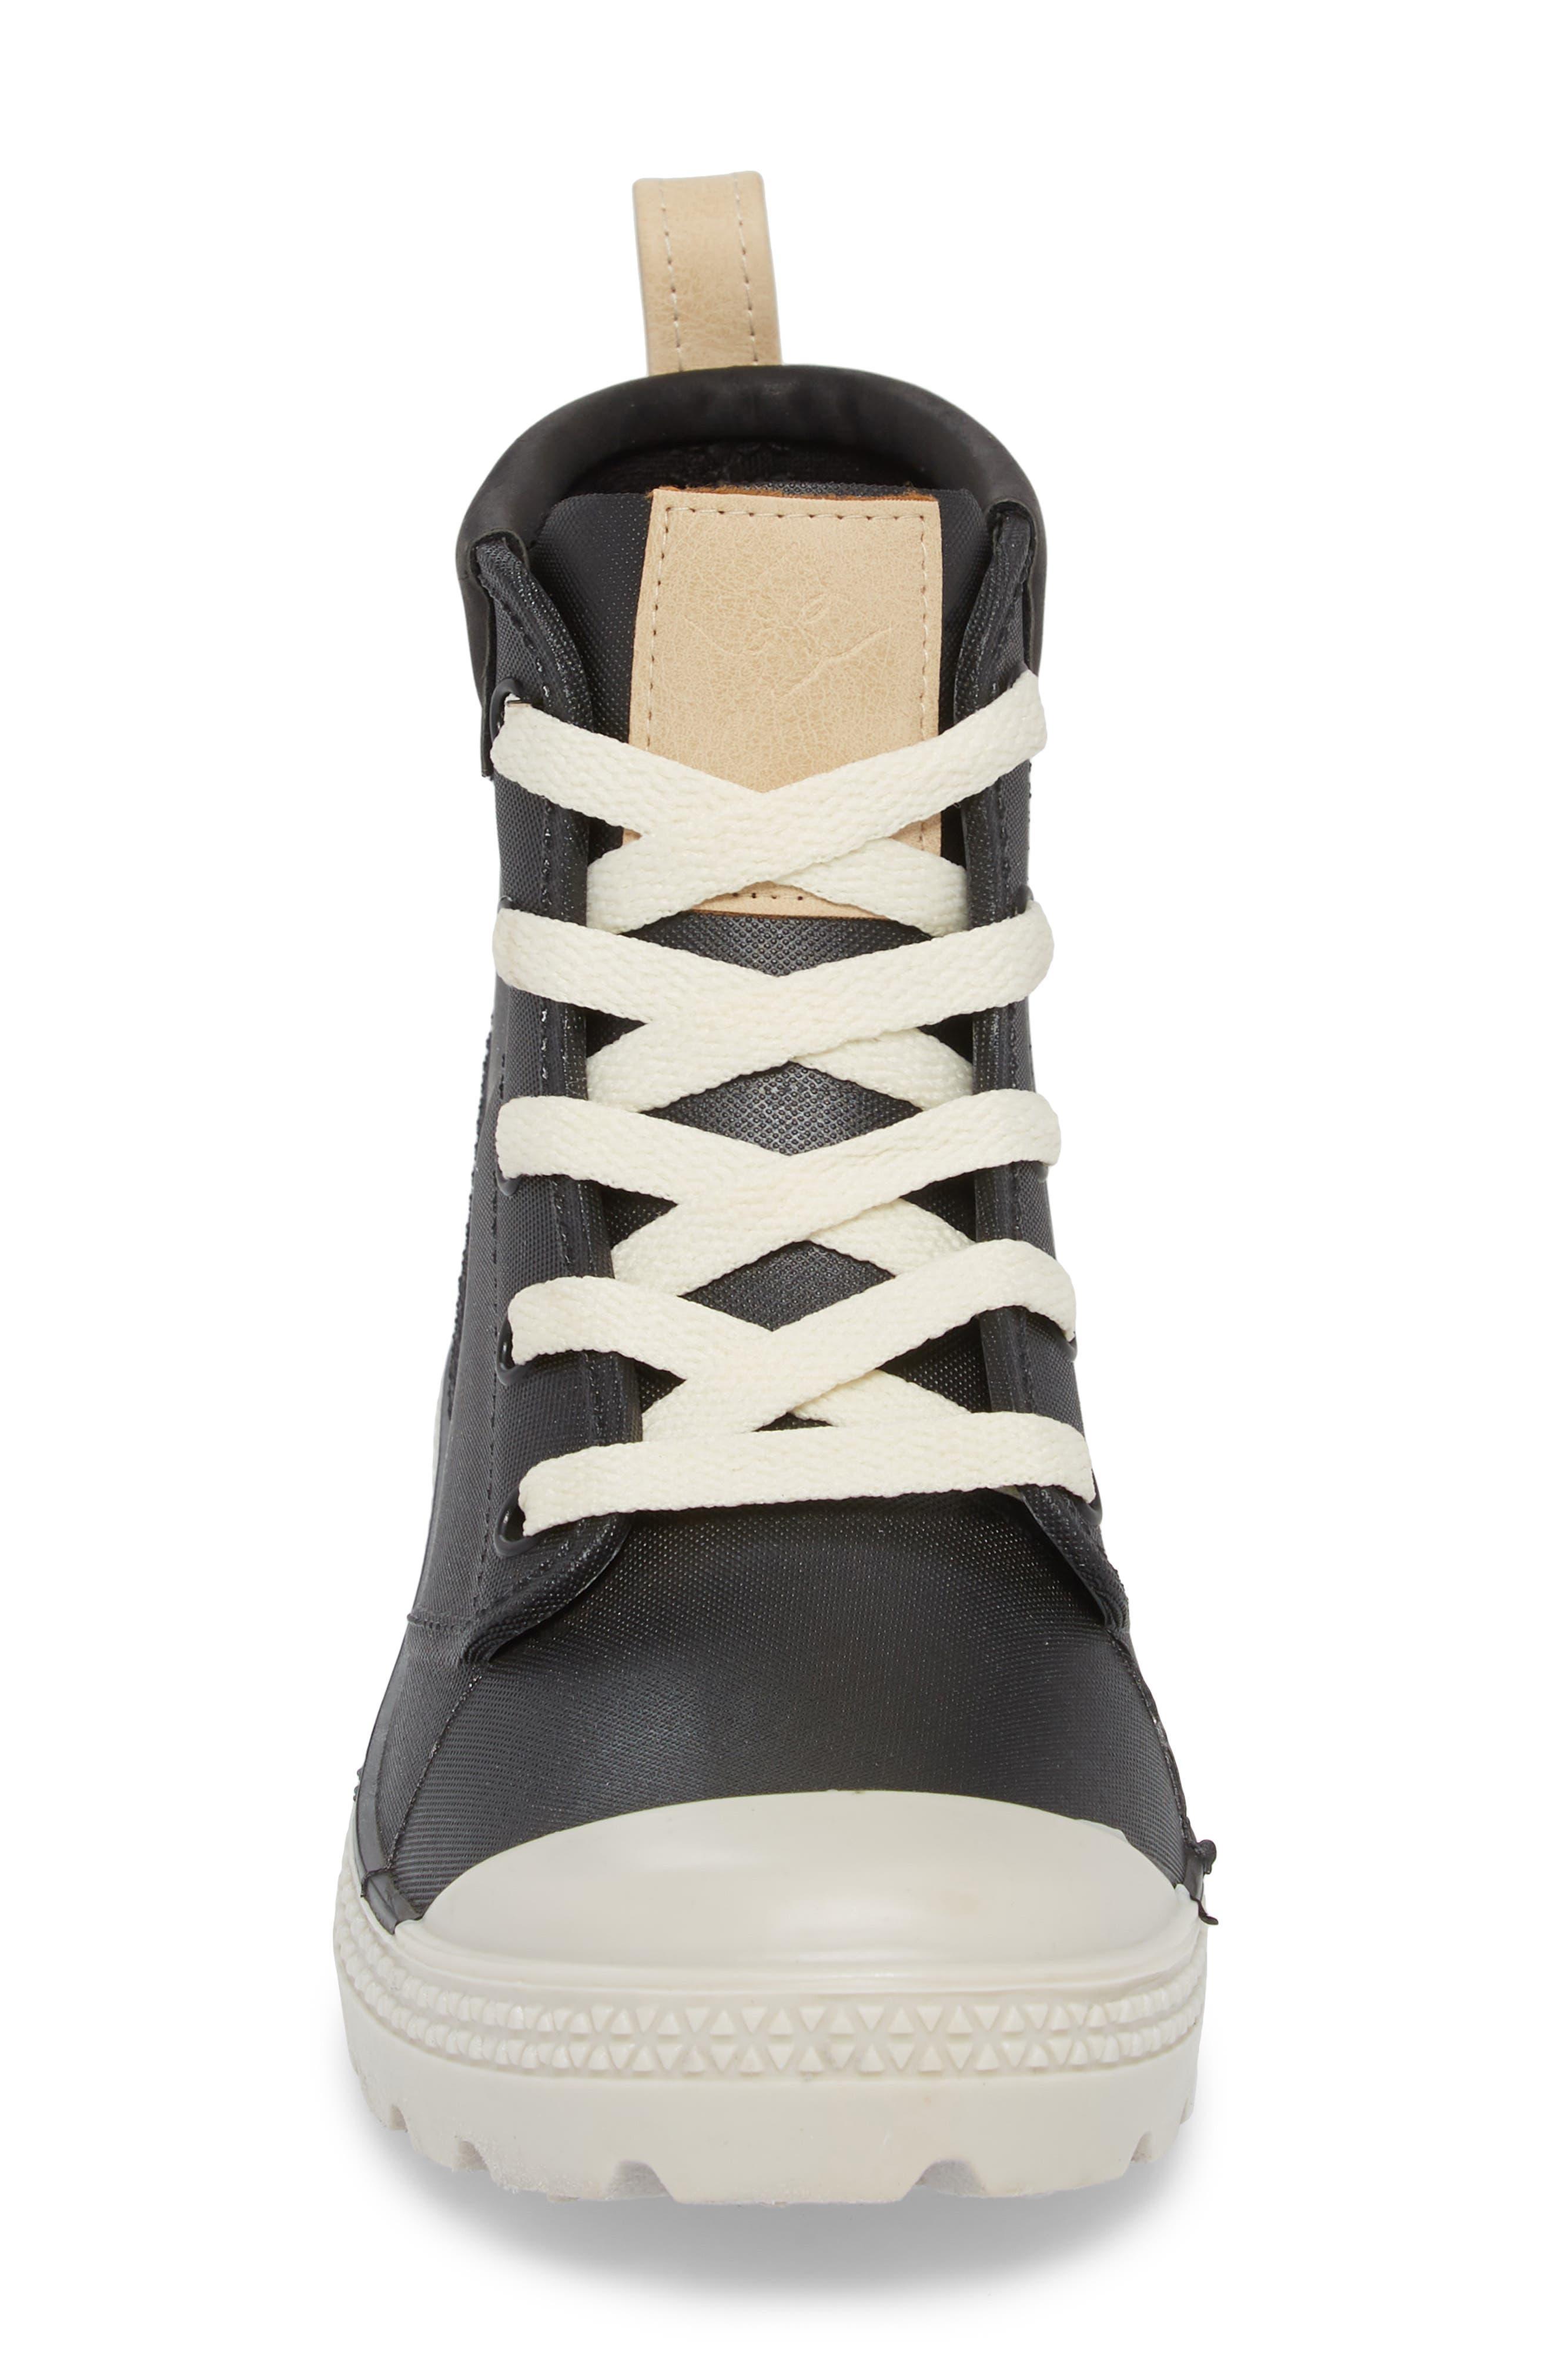 DÄV, Melrose Waterproof Sneaker Boot, Alternate thumbnail 4, color, 001